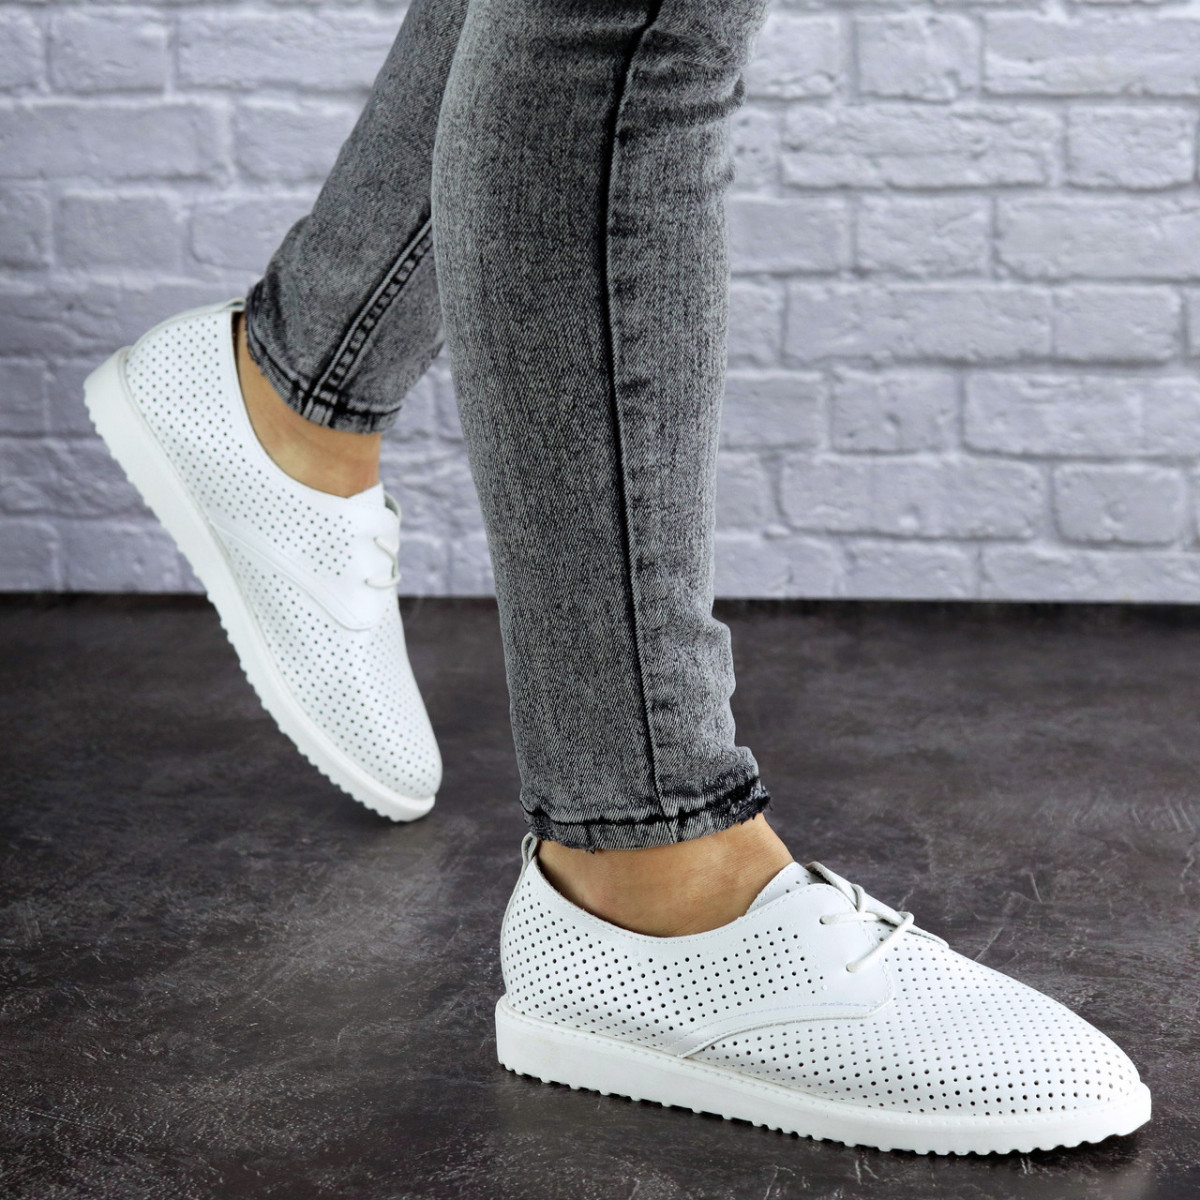 Женские белые туфли Twinkle 1784 (36 размер)